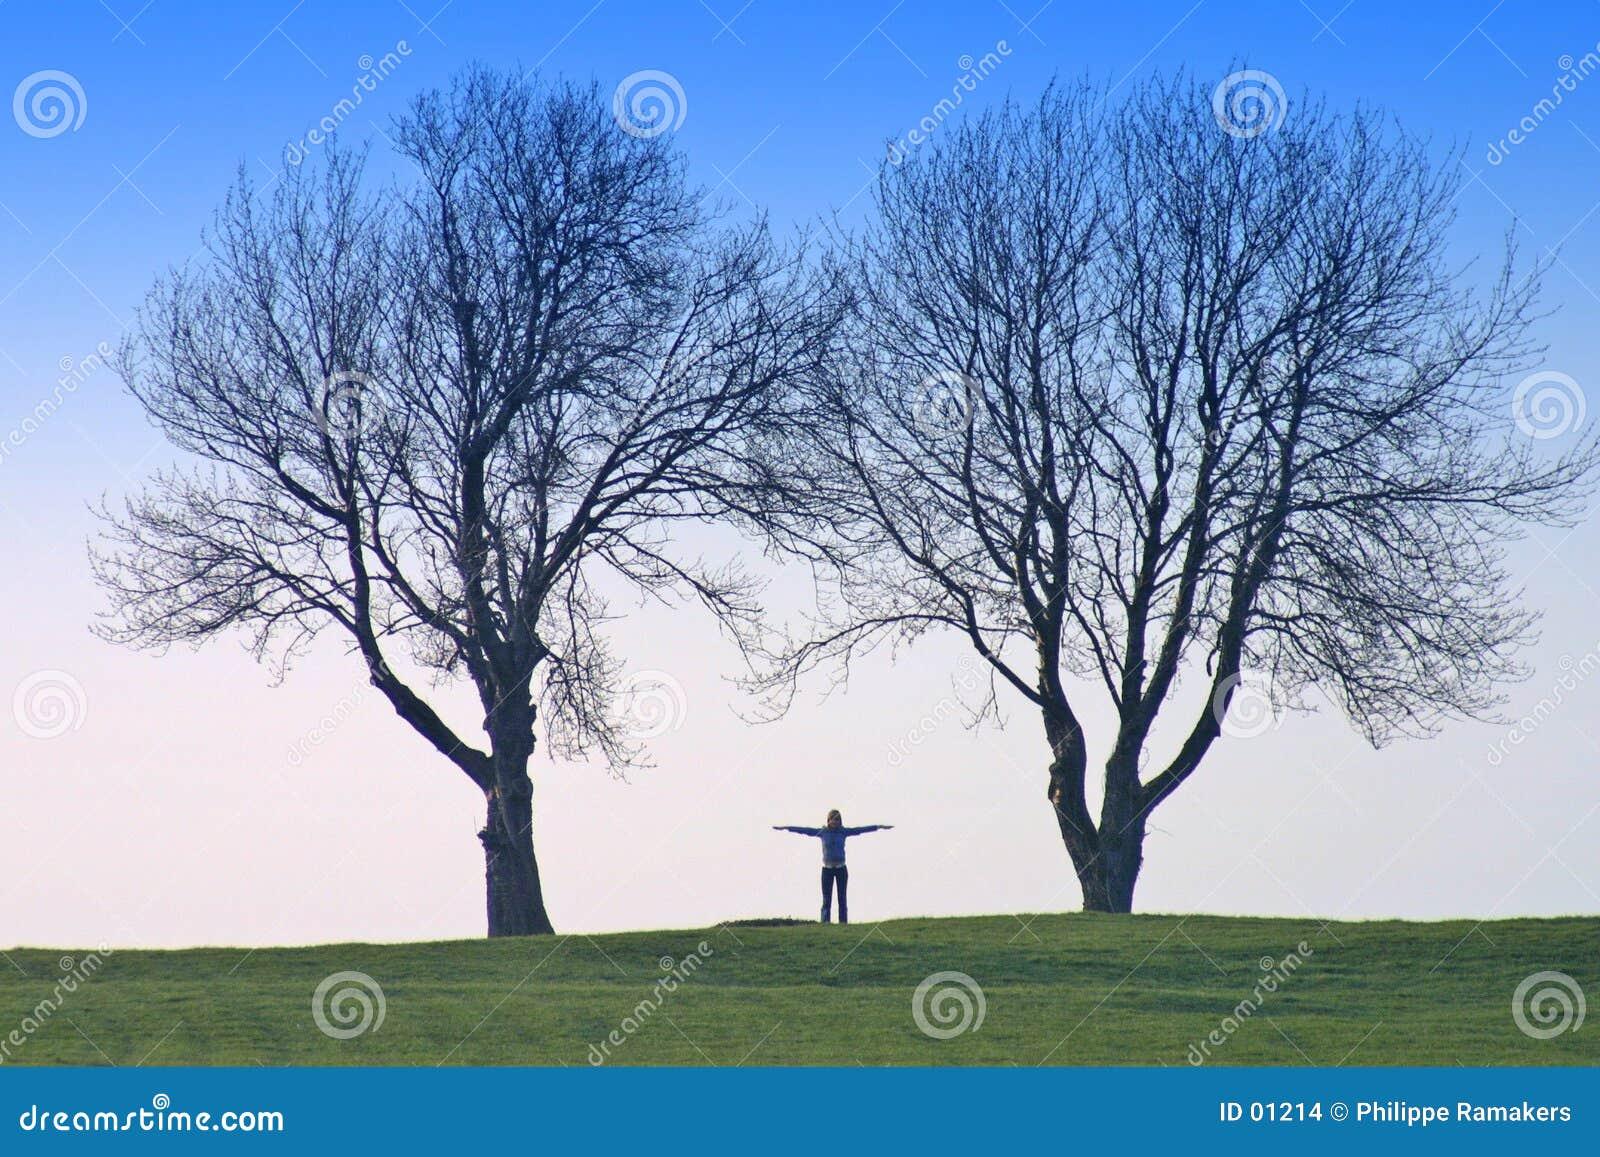 Figura umana ed alberi